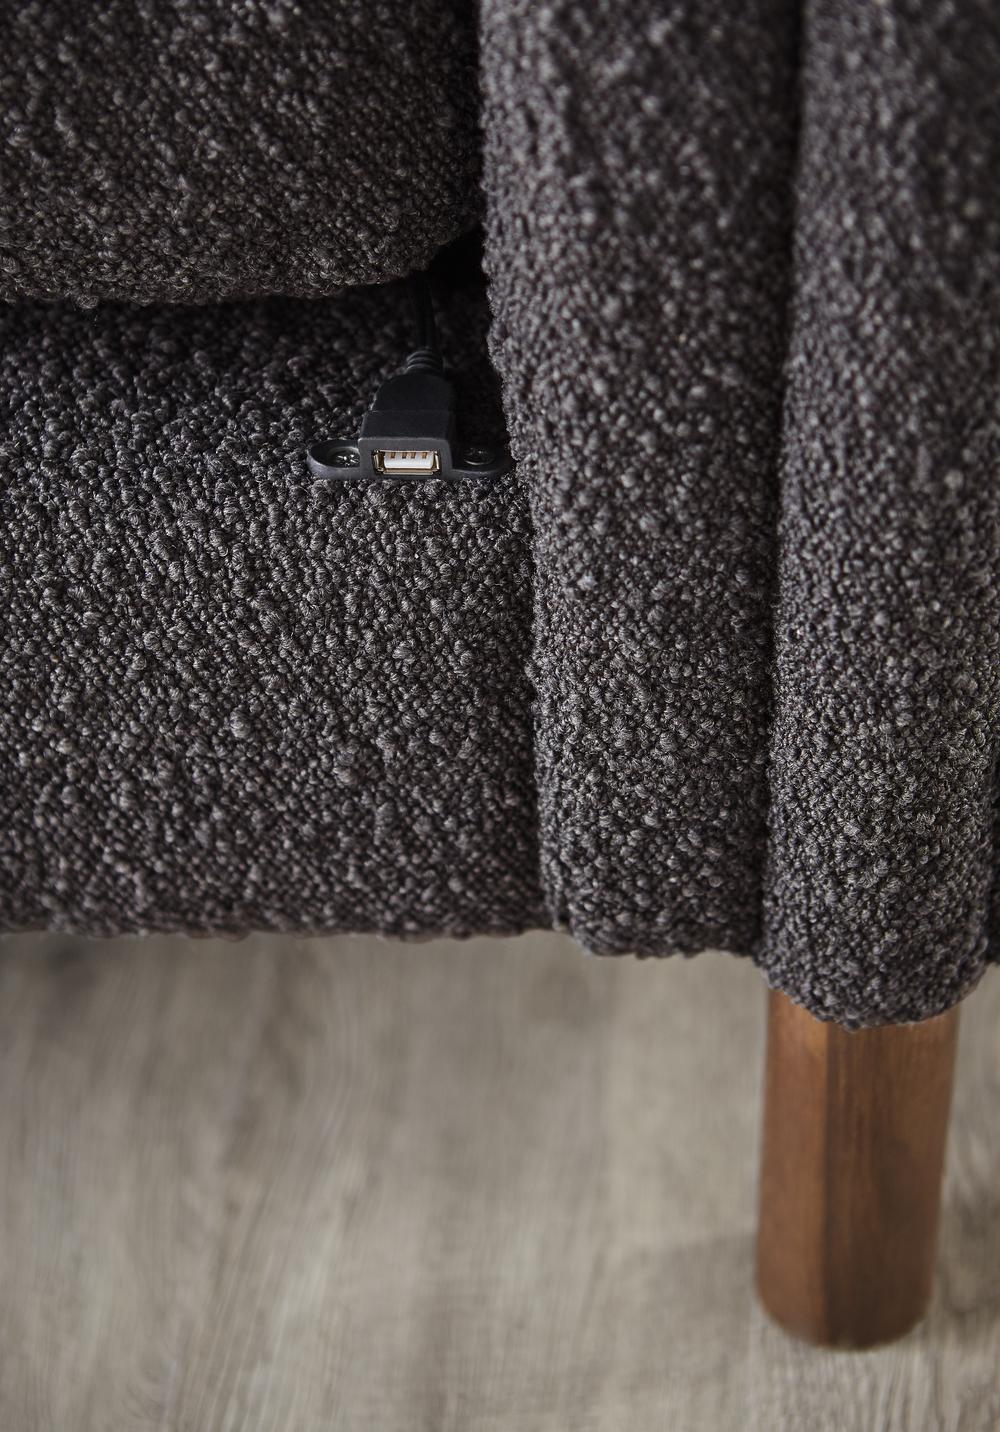 A.R.T. Furniture - Larsen Chair (Truffle)